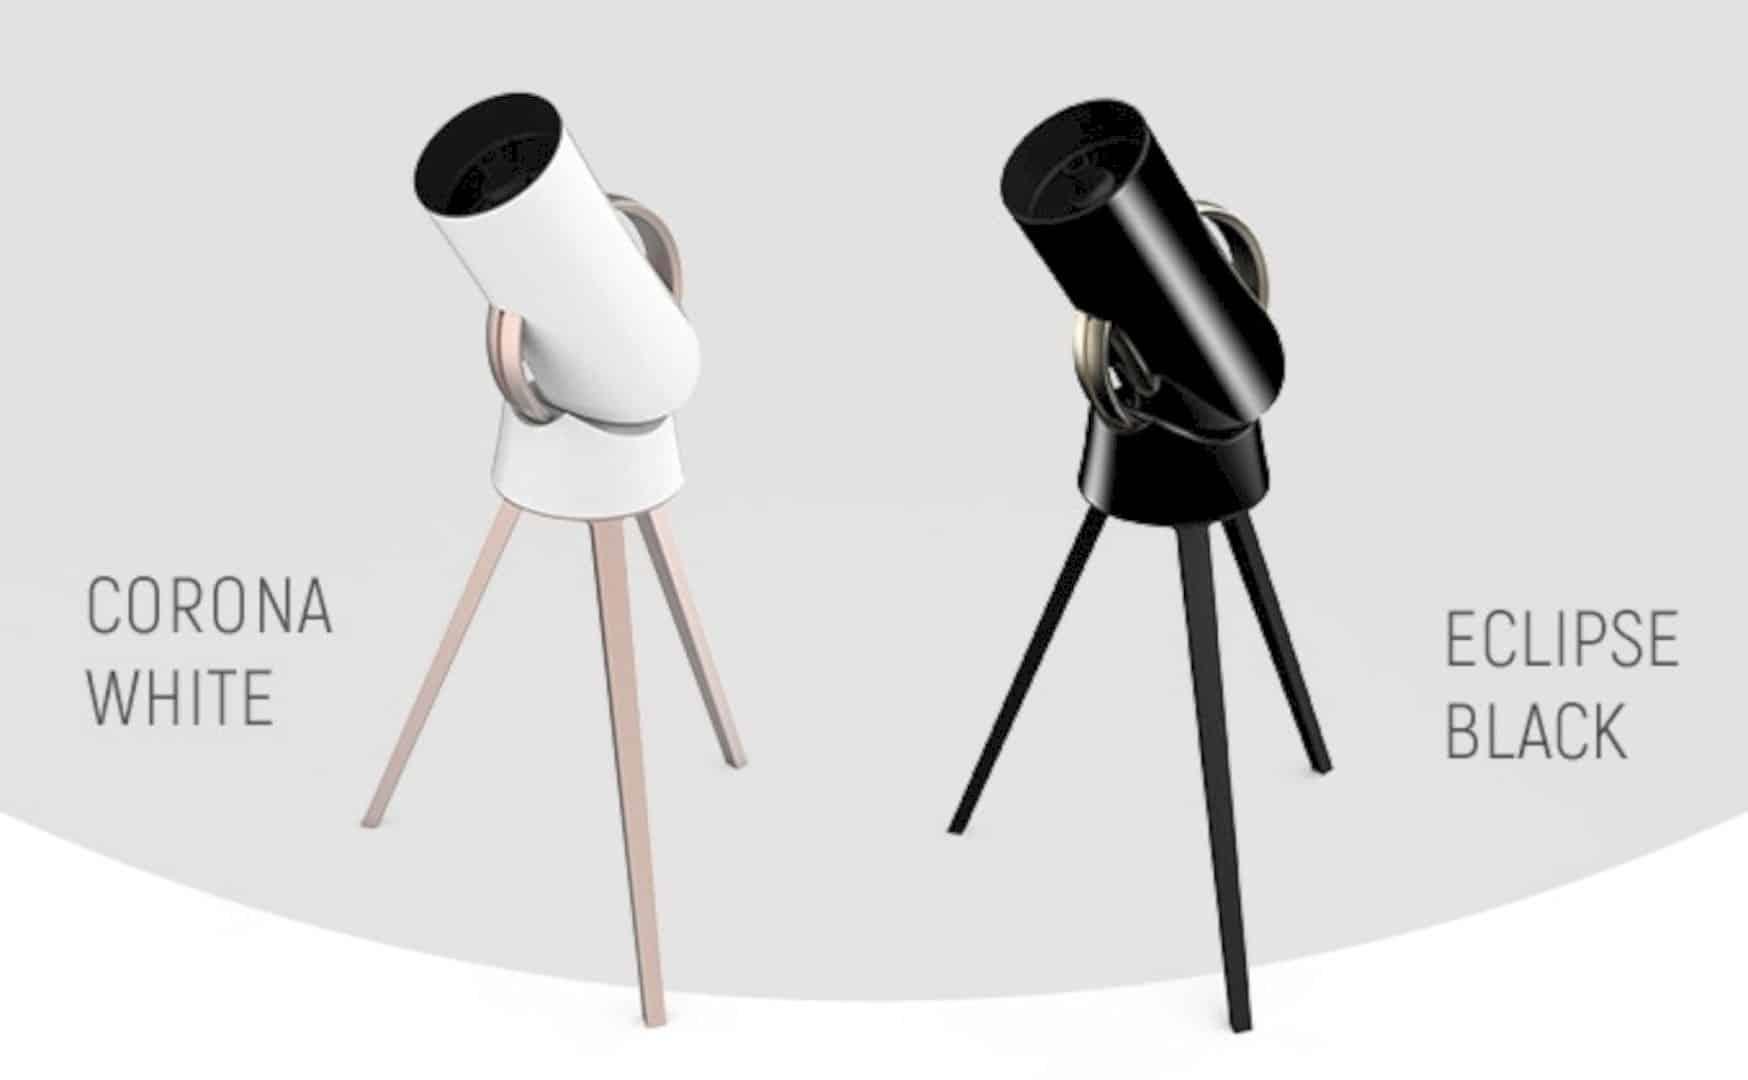 Hiuni Smart Telescope 5